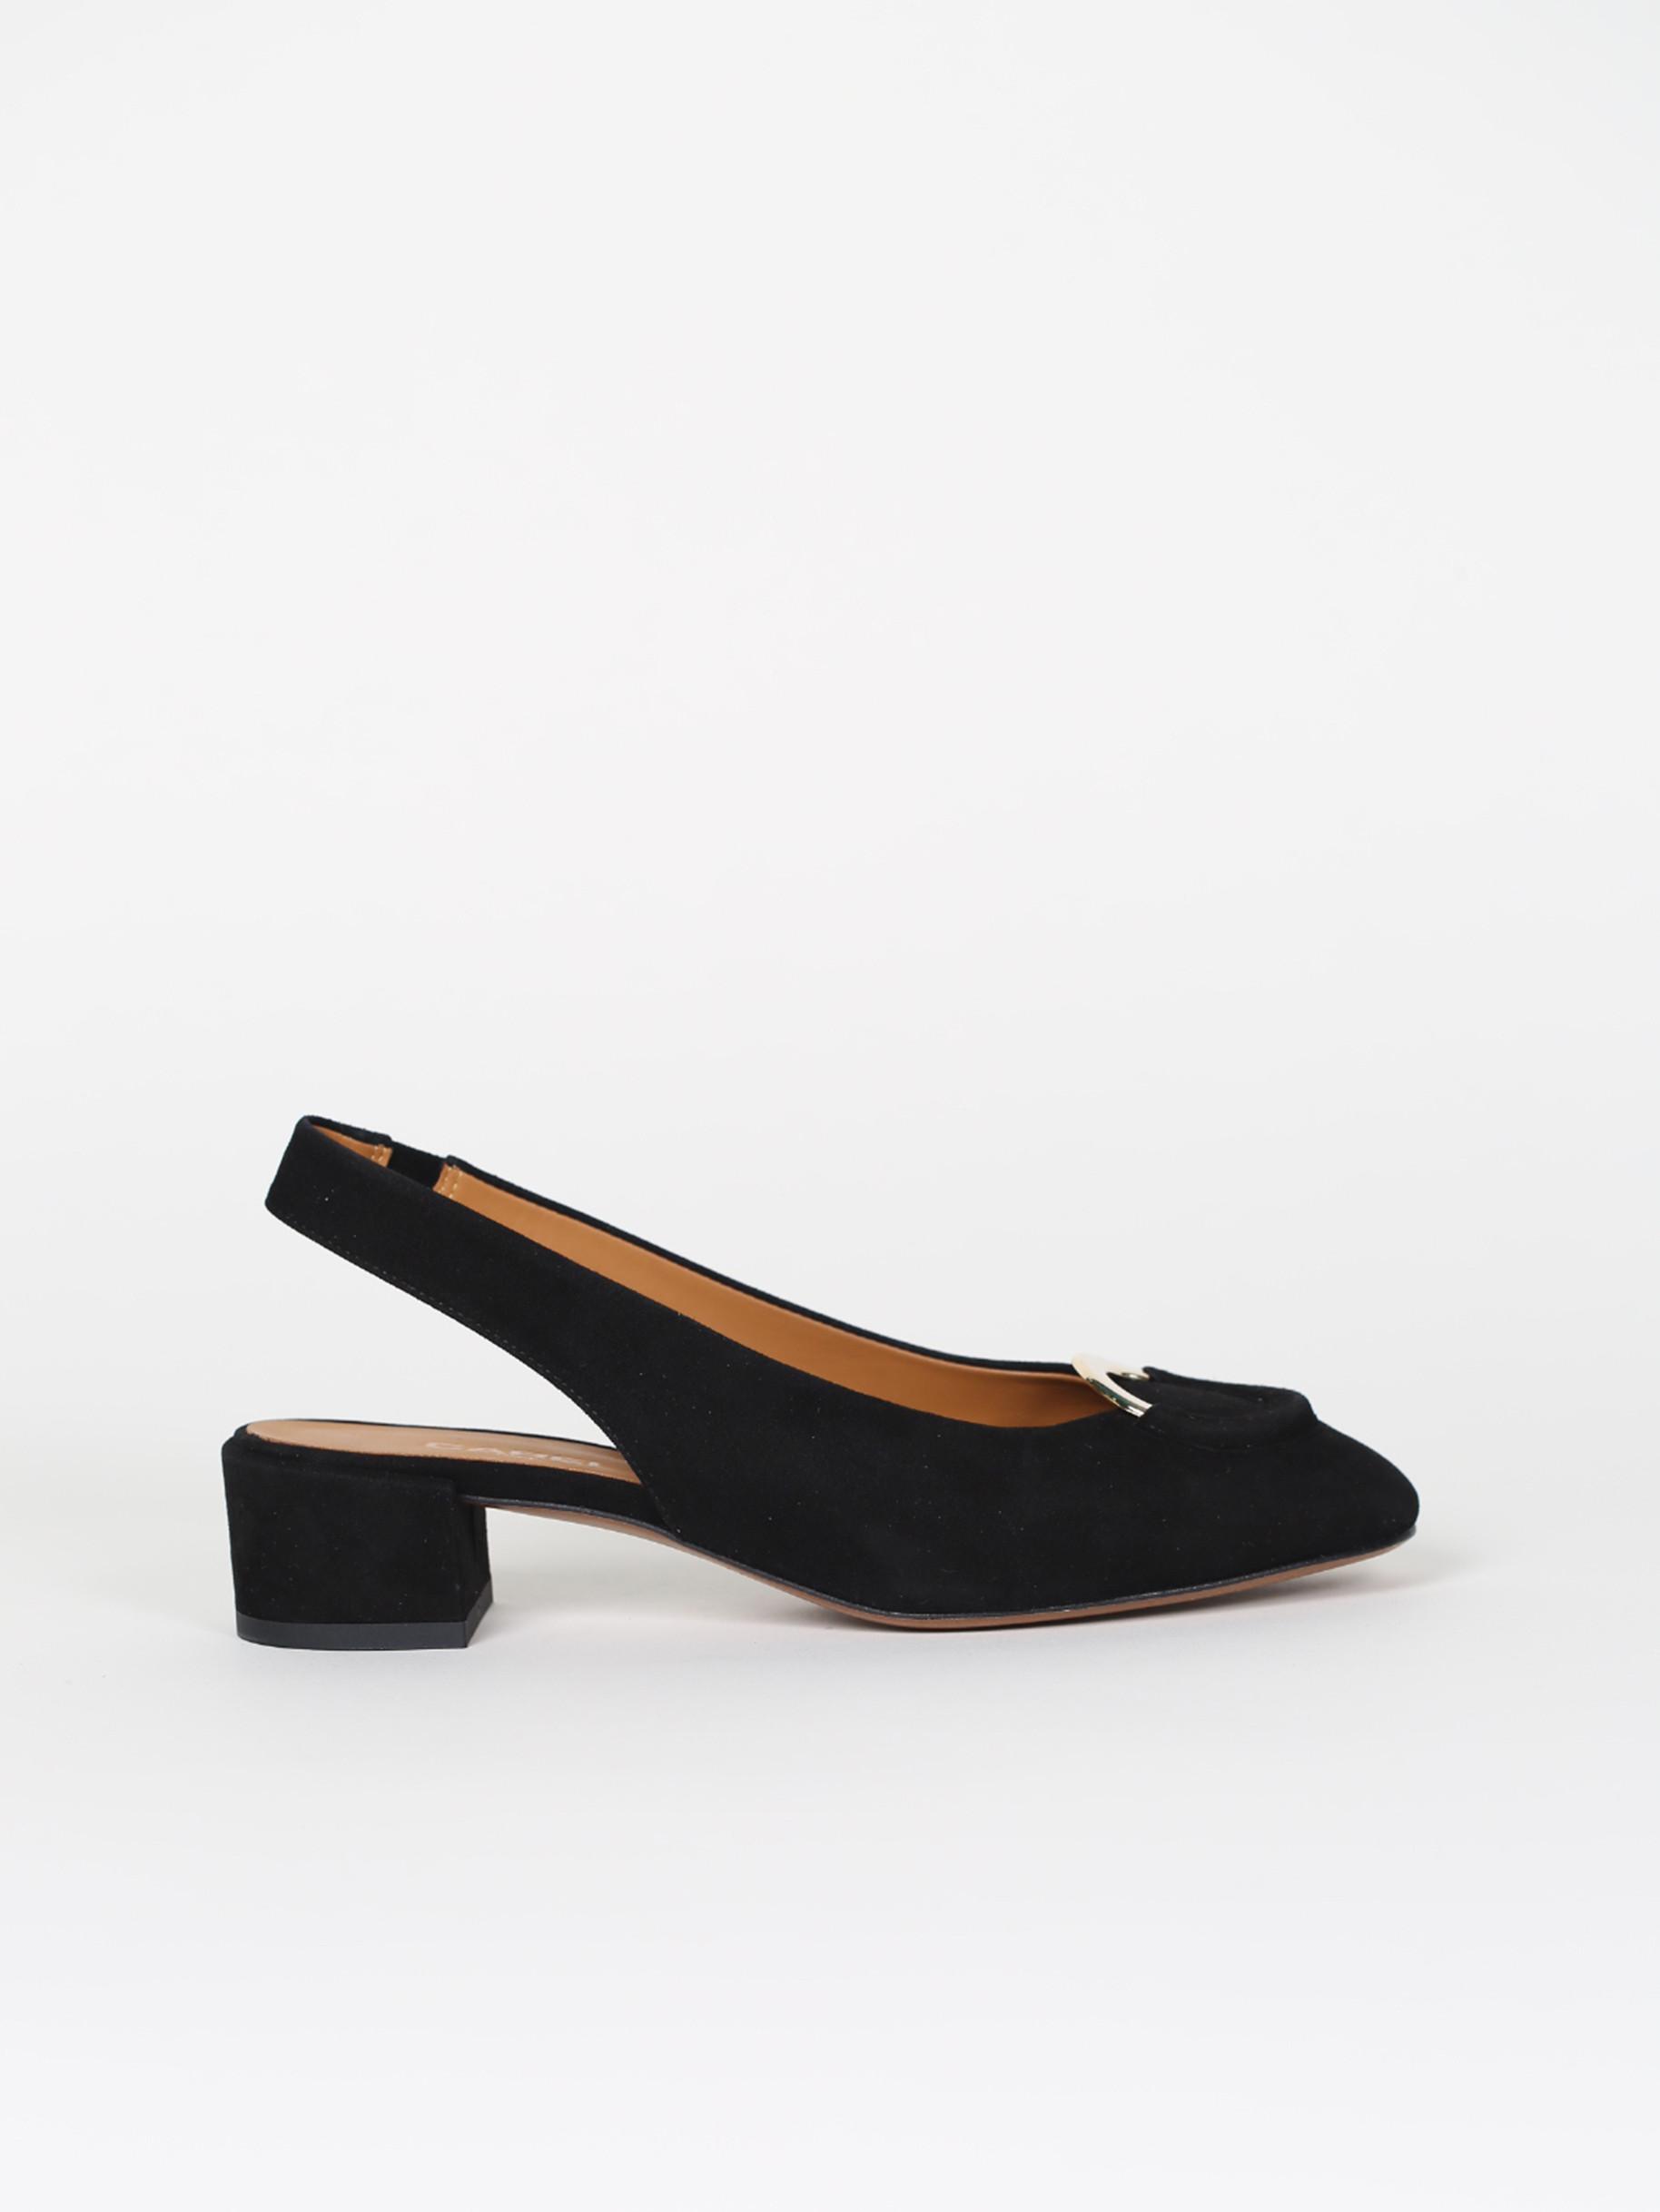 Black suede leather trotteurs